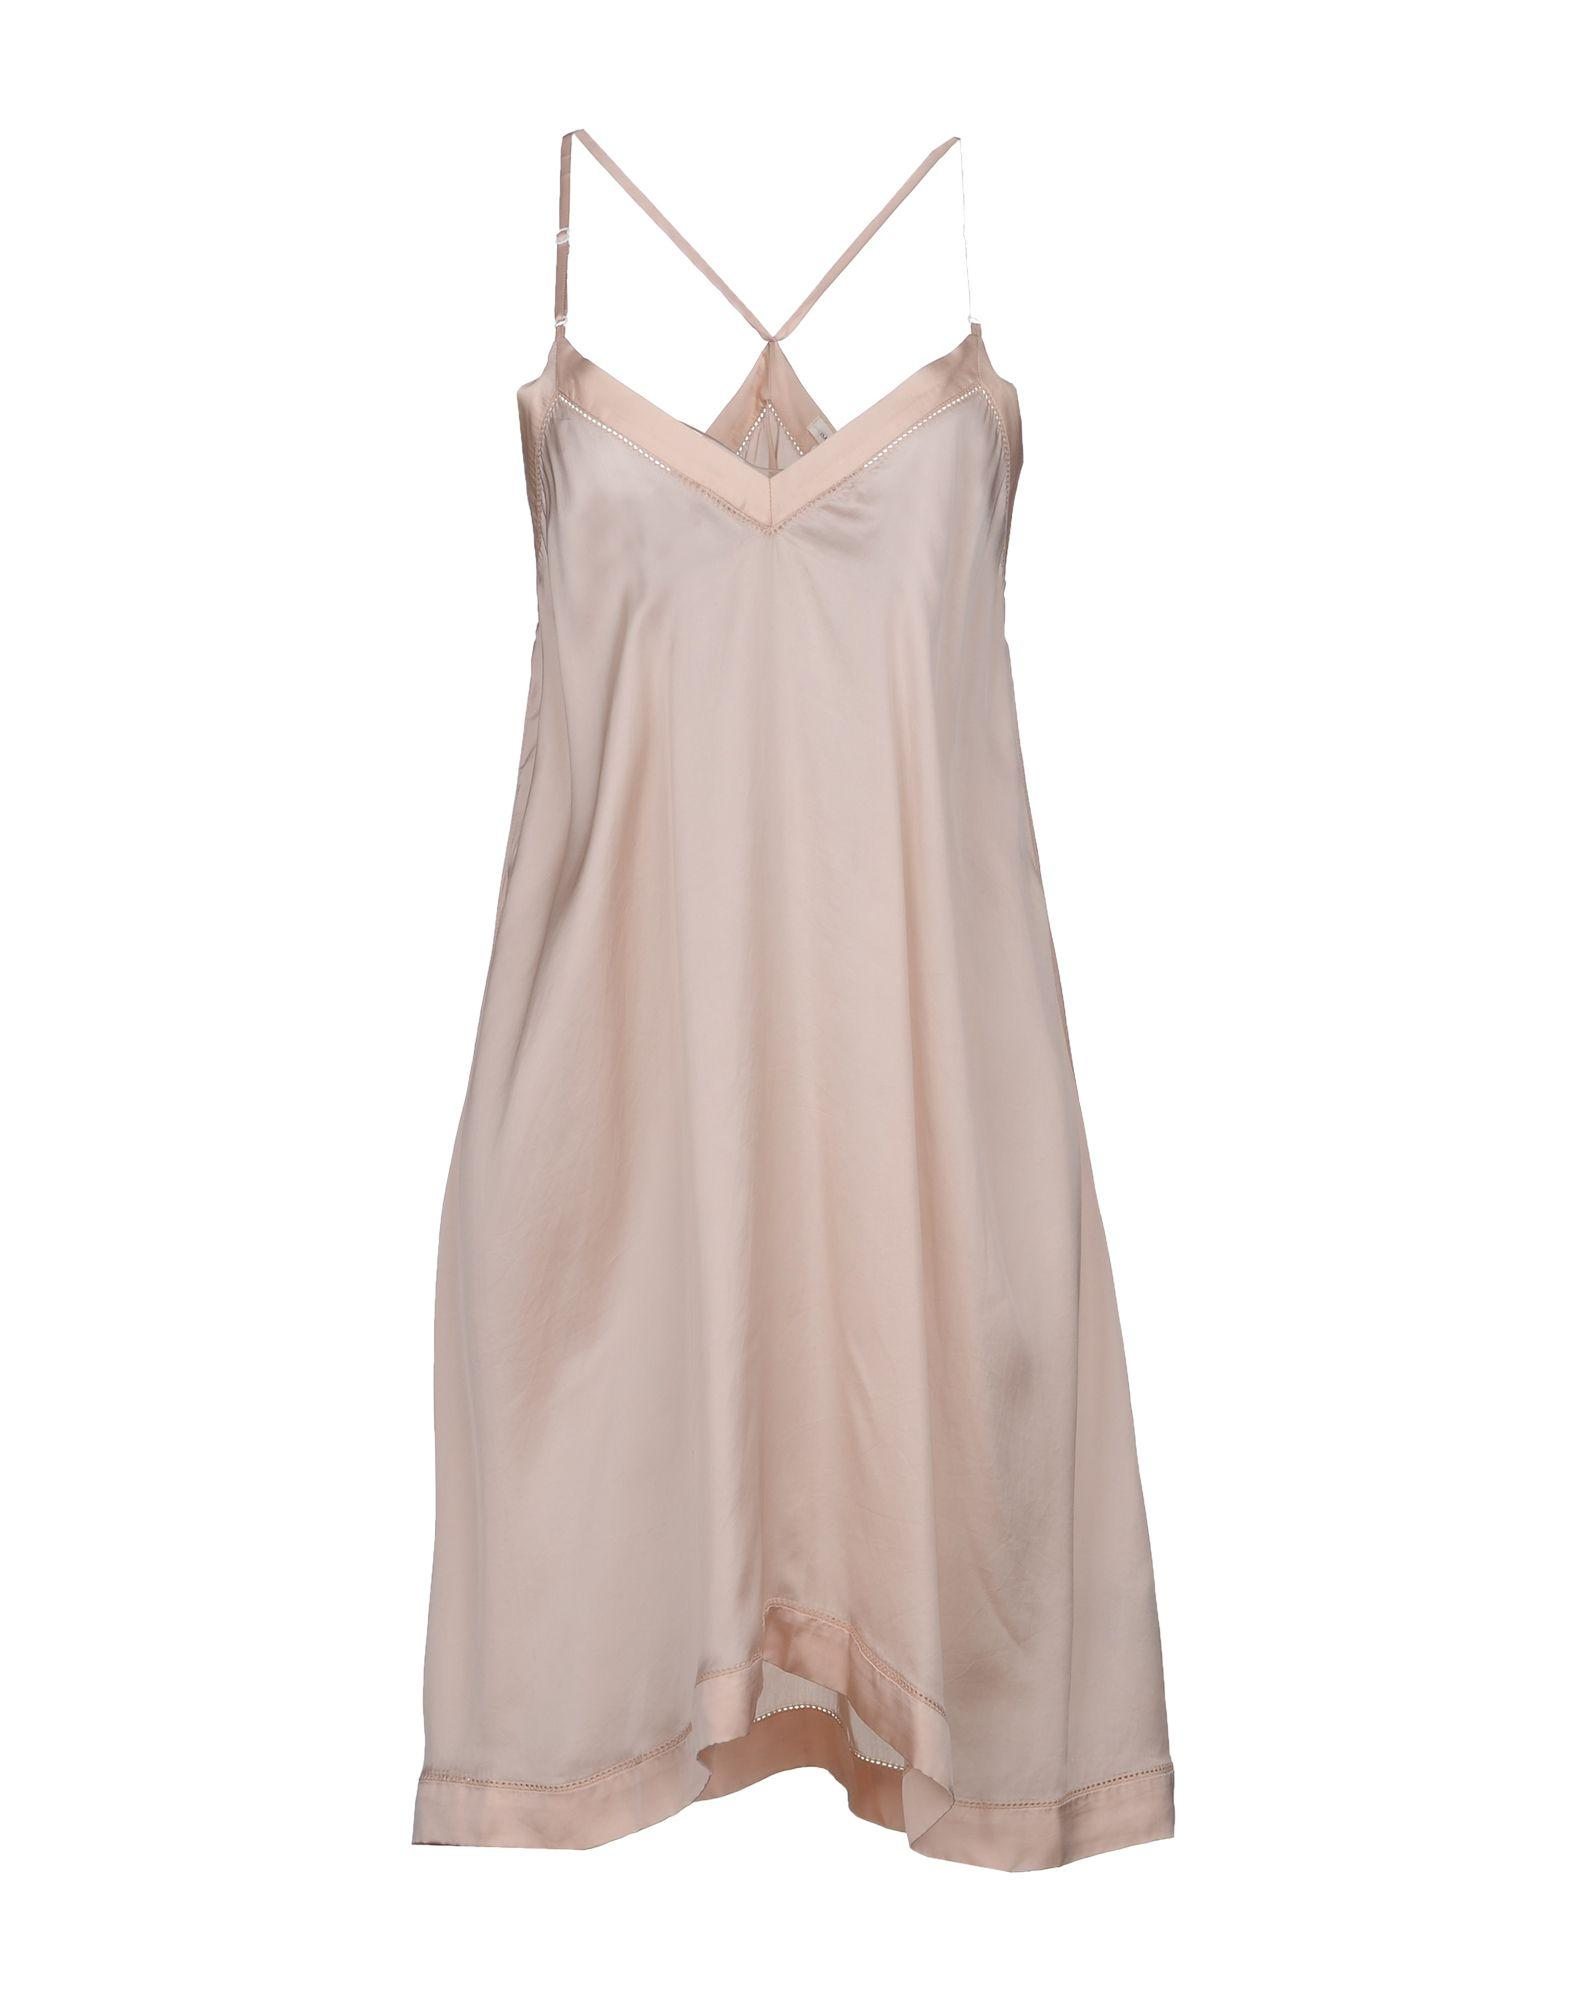 Etoile Isabel Marant Short Dress In Pink